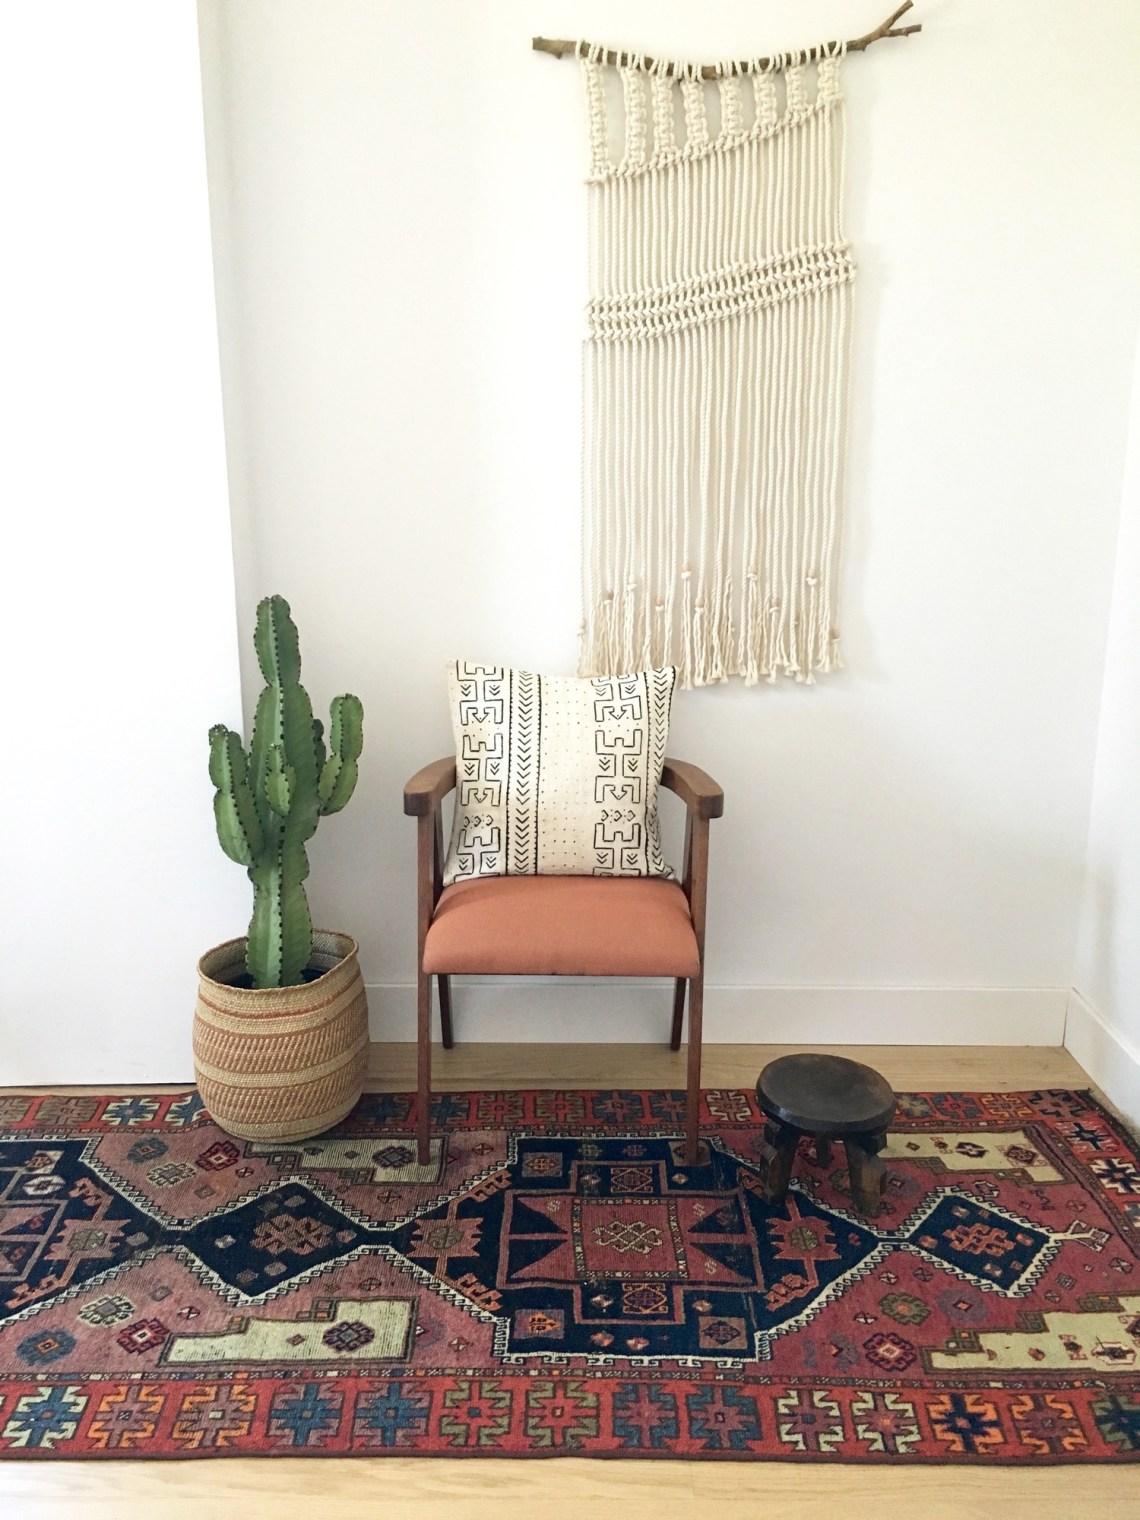 Your New Favorite Bohemian Home Décor Site | Glitter, Inc.